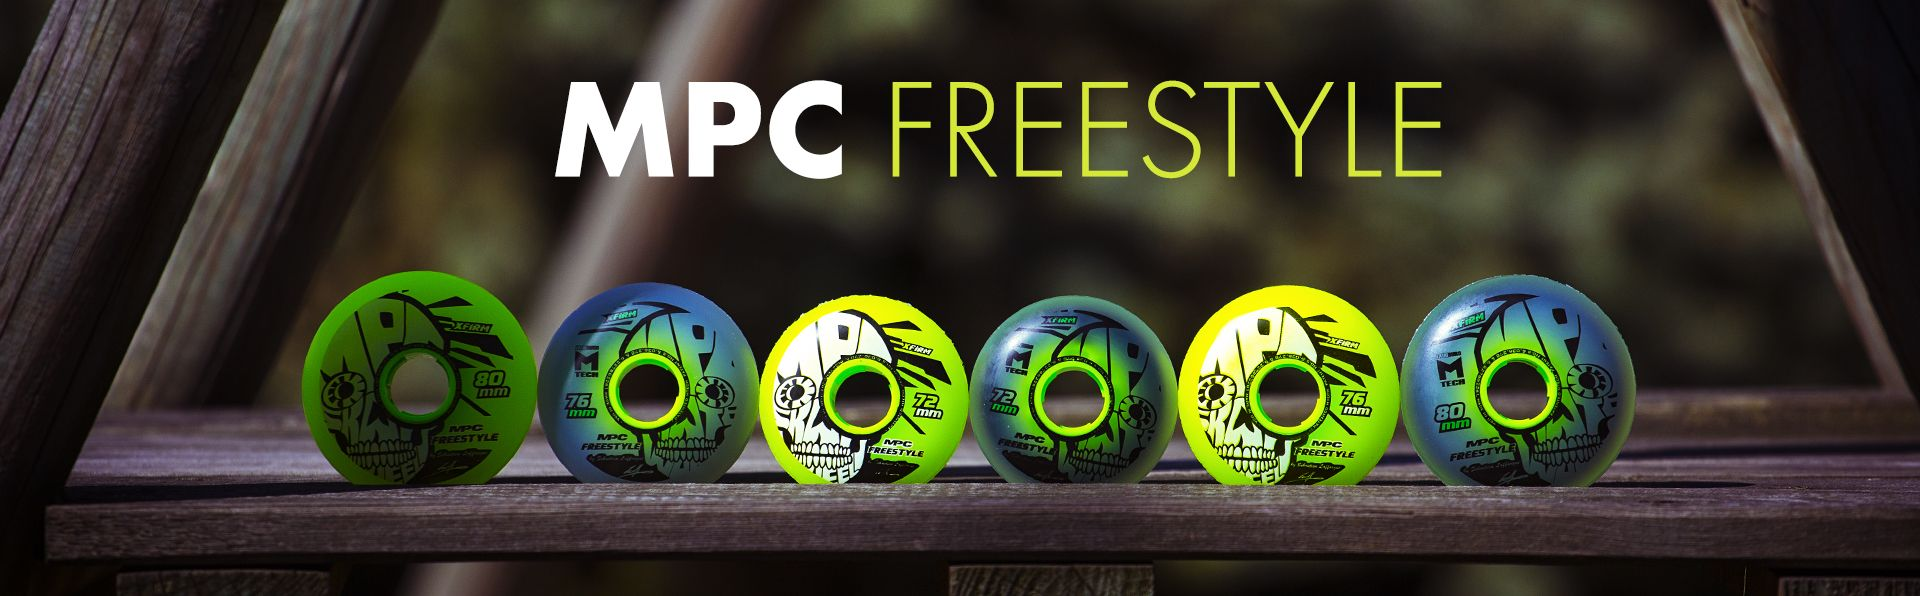 MPC - Freestyle